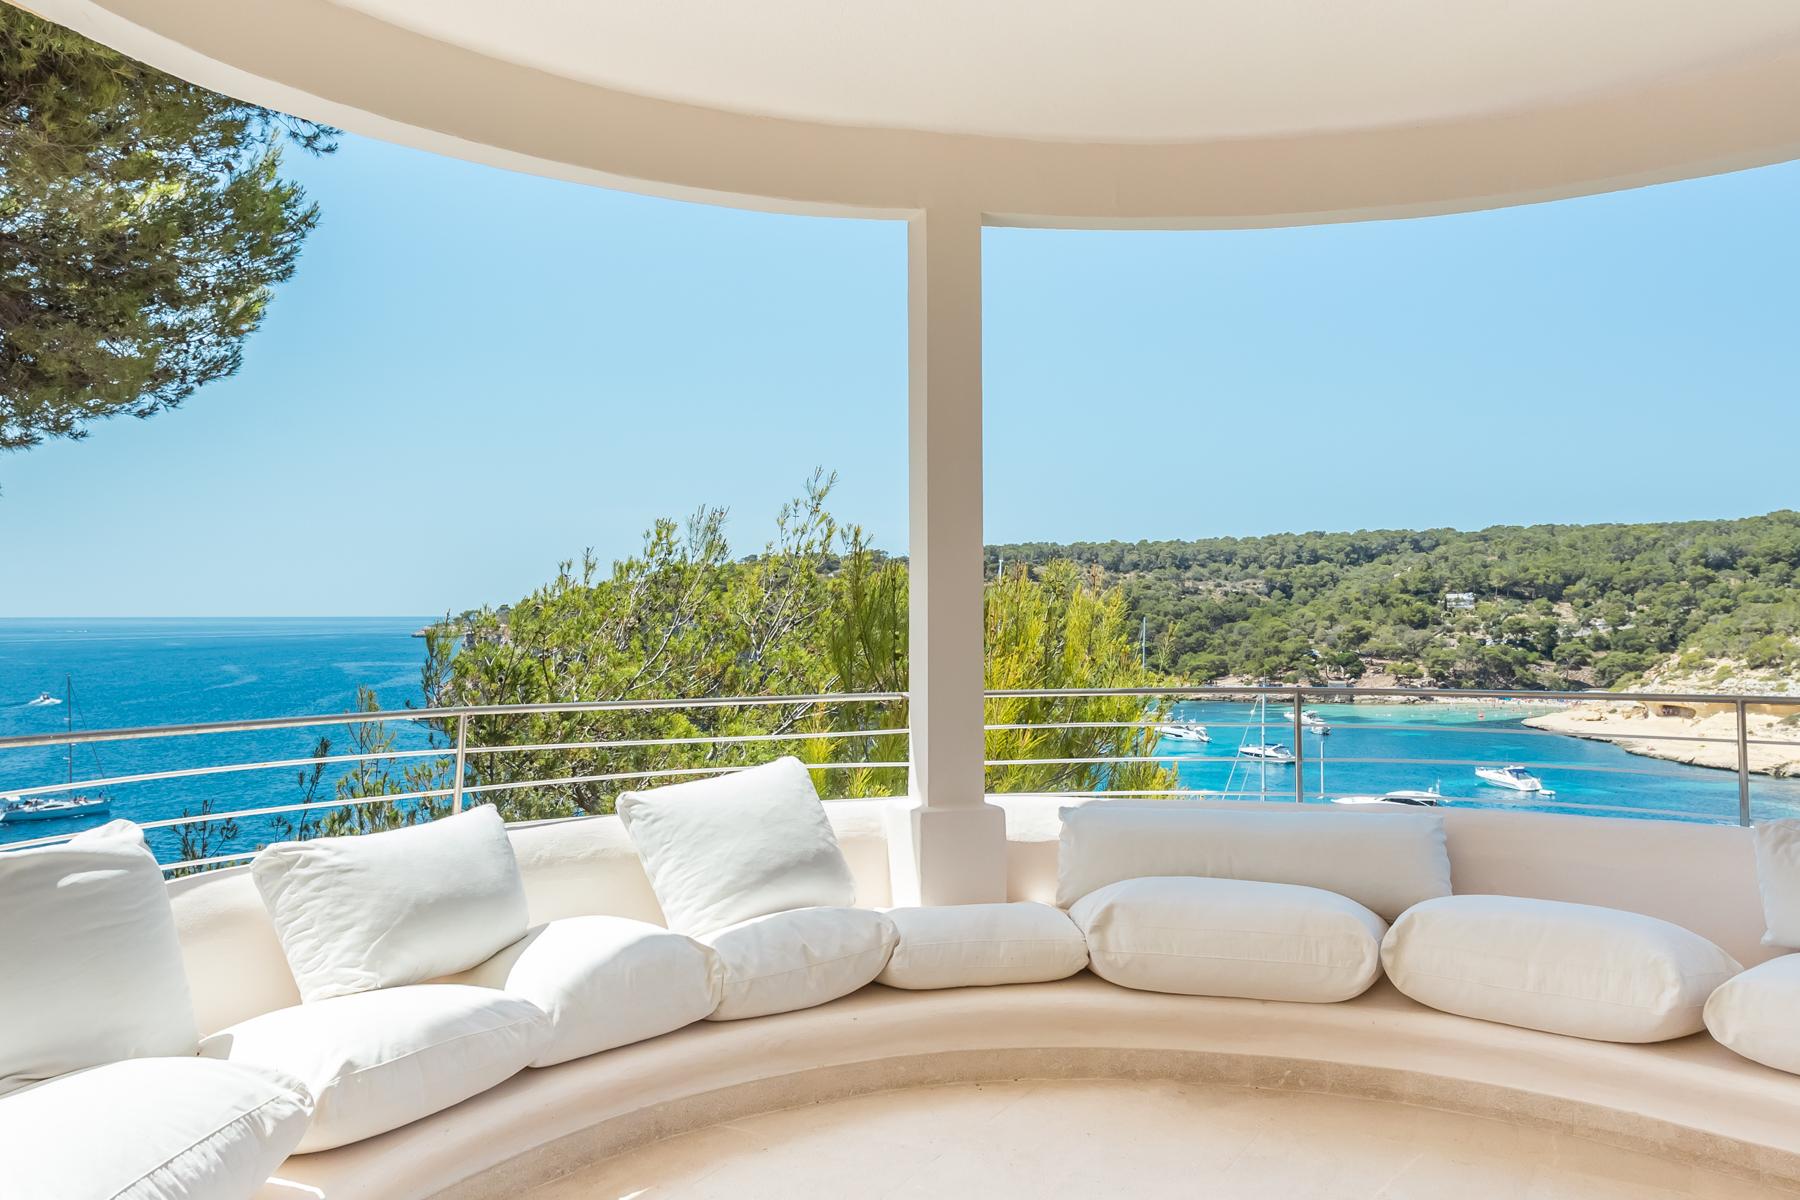 Moradia para Arrendamento às Splendid frontline villa in Sol de Mallorca Sol De Mallorca, Palma De Maiorca, Espanha